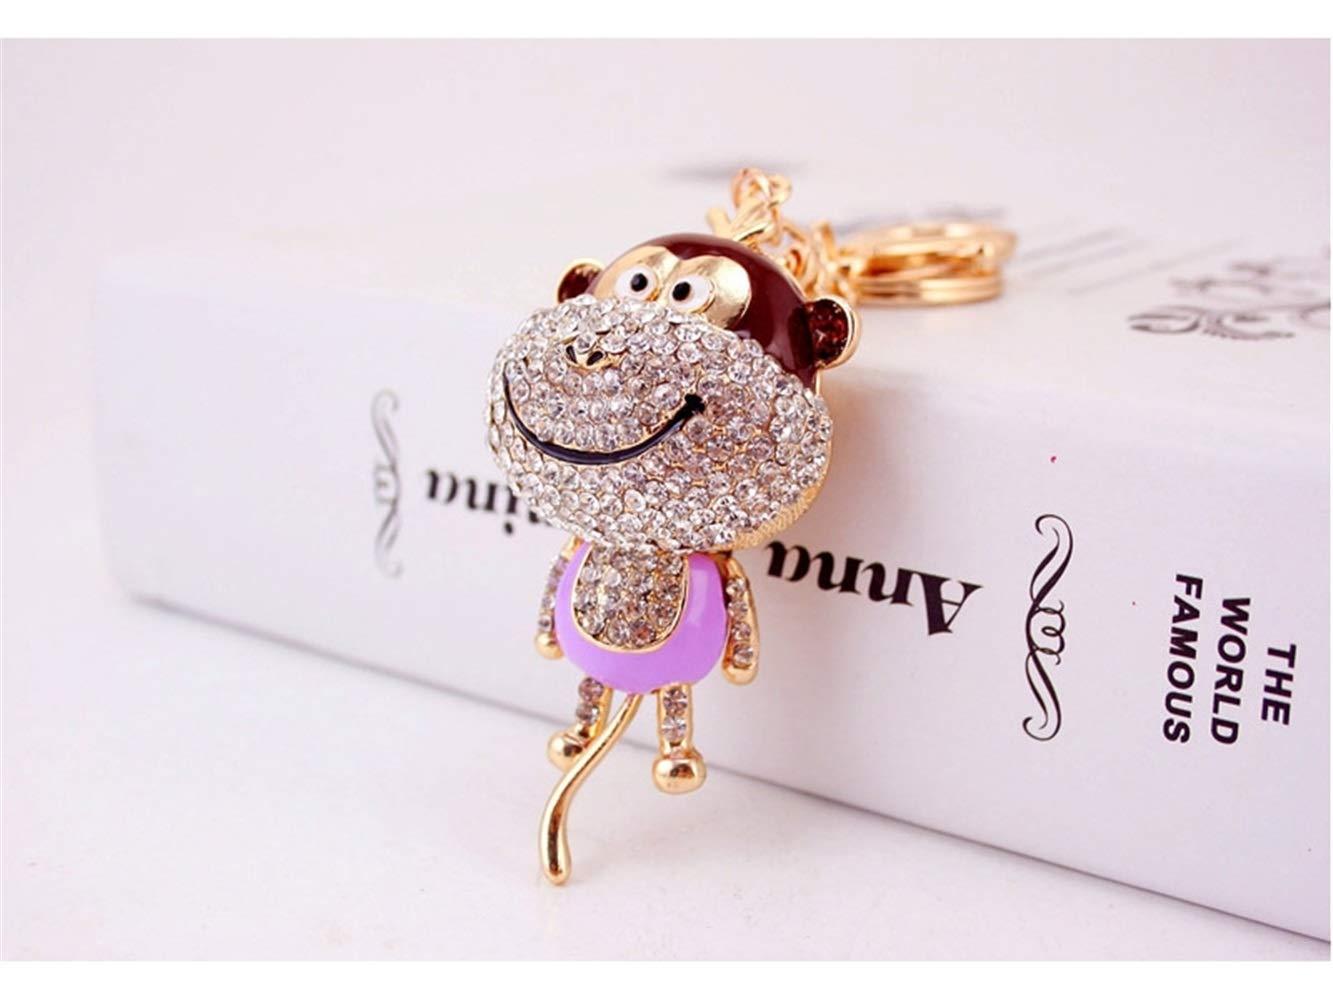 Car Keychain, Cute Diamond Long Tail Monkey Keychain Animal Shape Key Trinket Car Bag Key Holder Decorations(Purple) for Gift